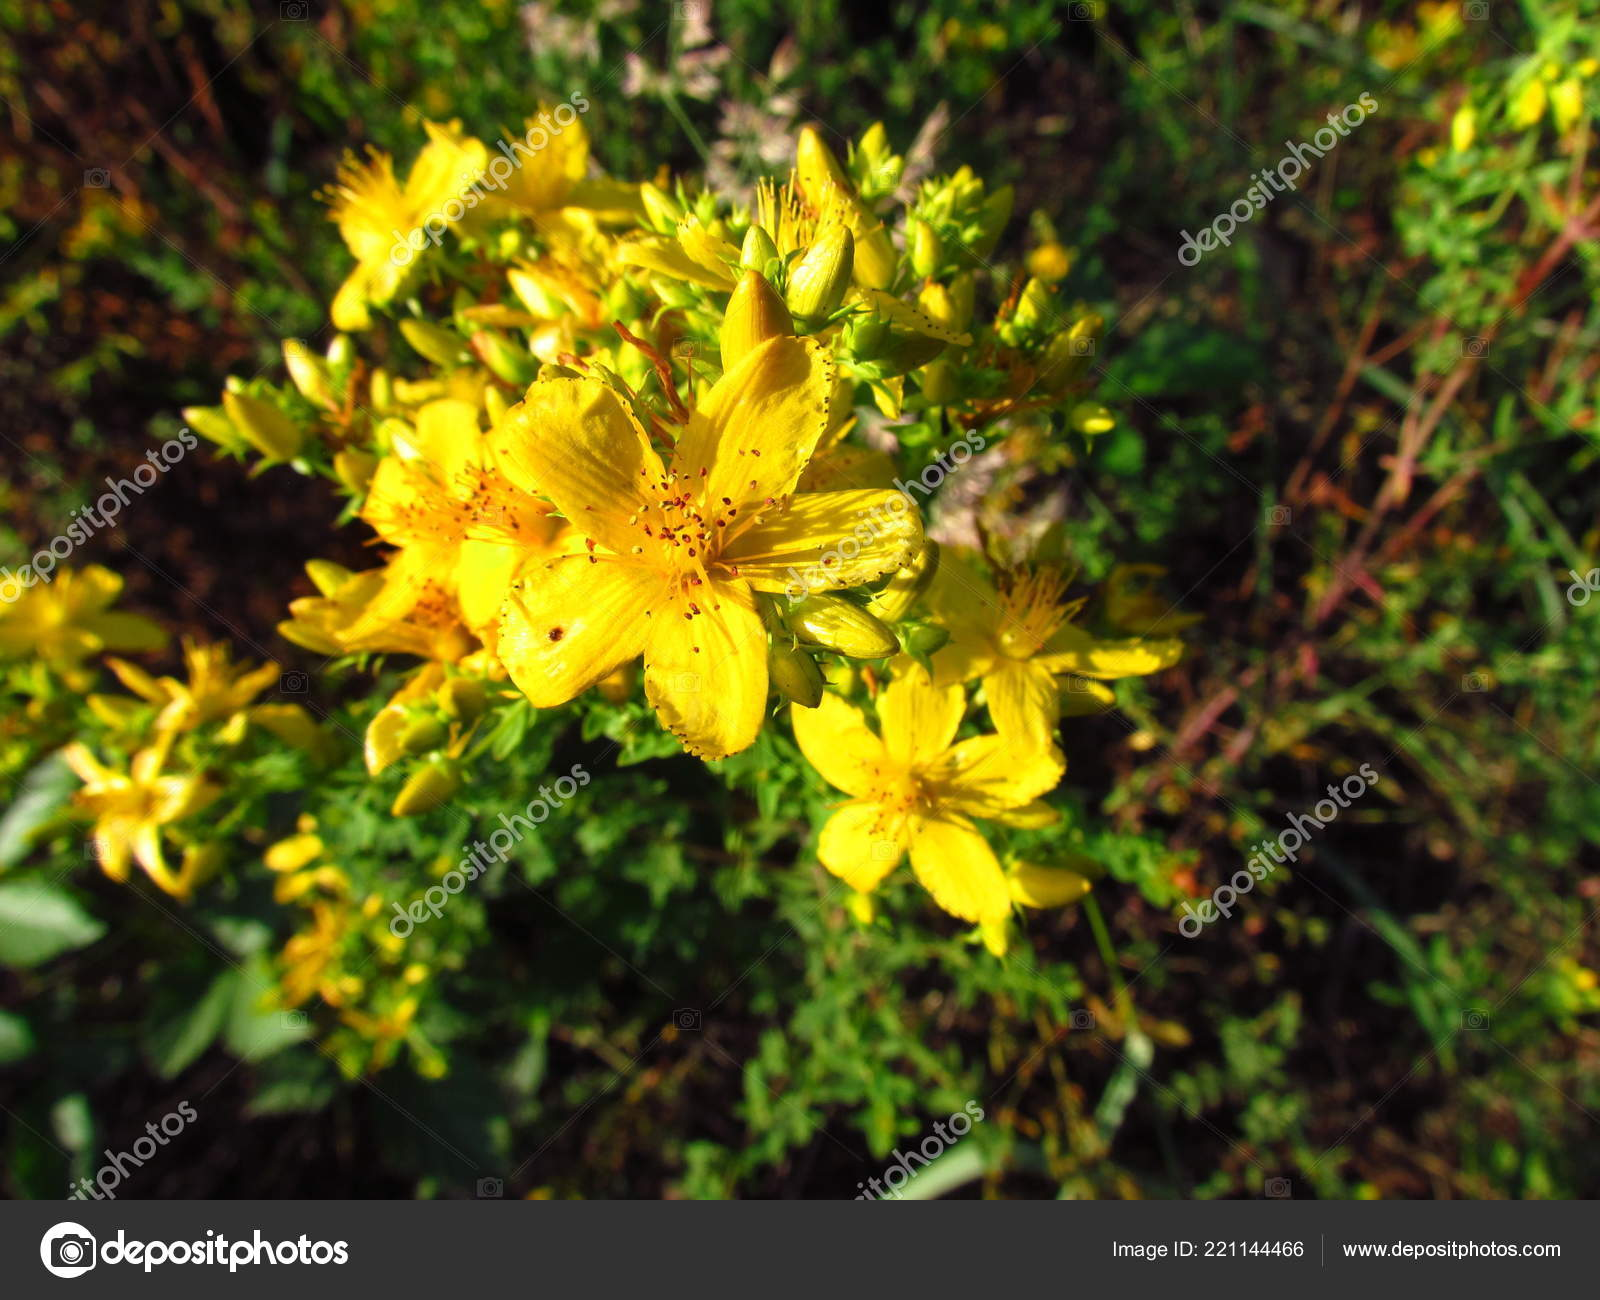 Hypericum Perforatum Detalle De Flor Amarilla De La Planta